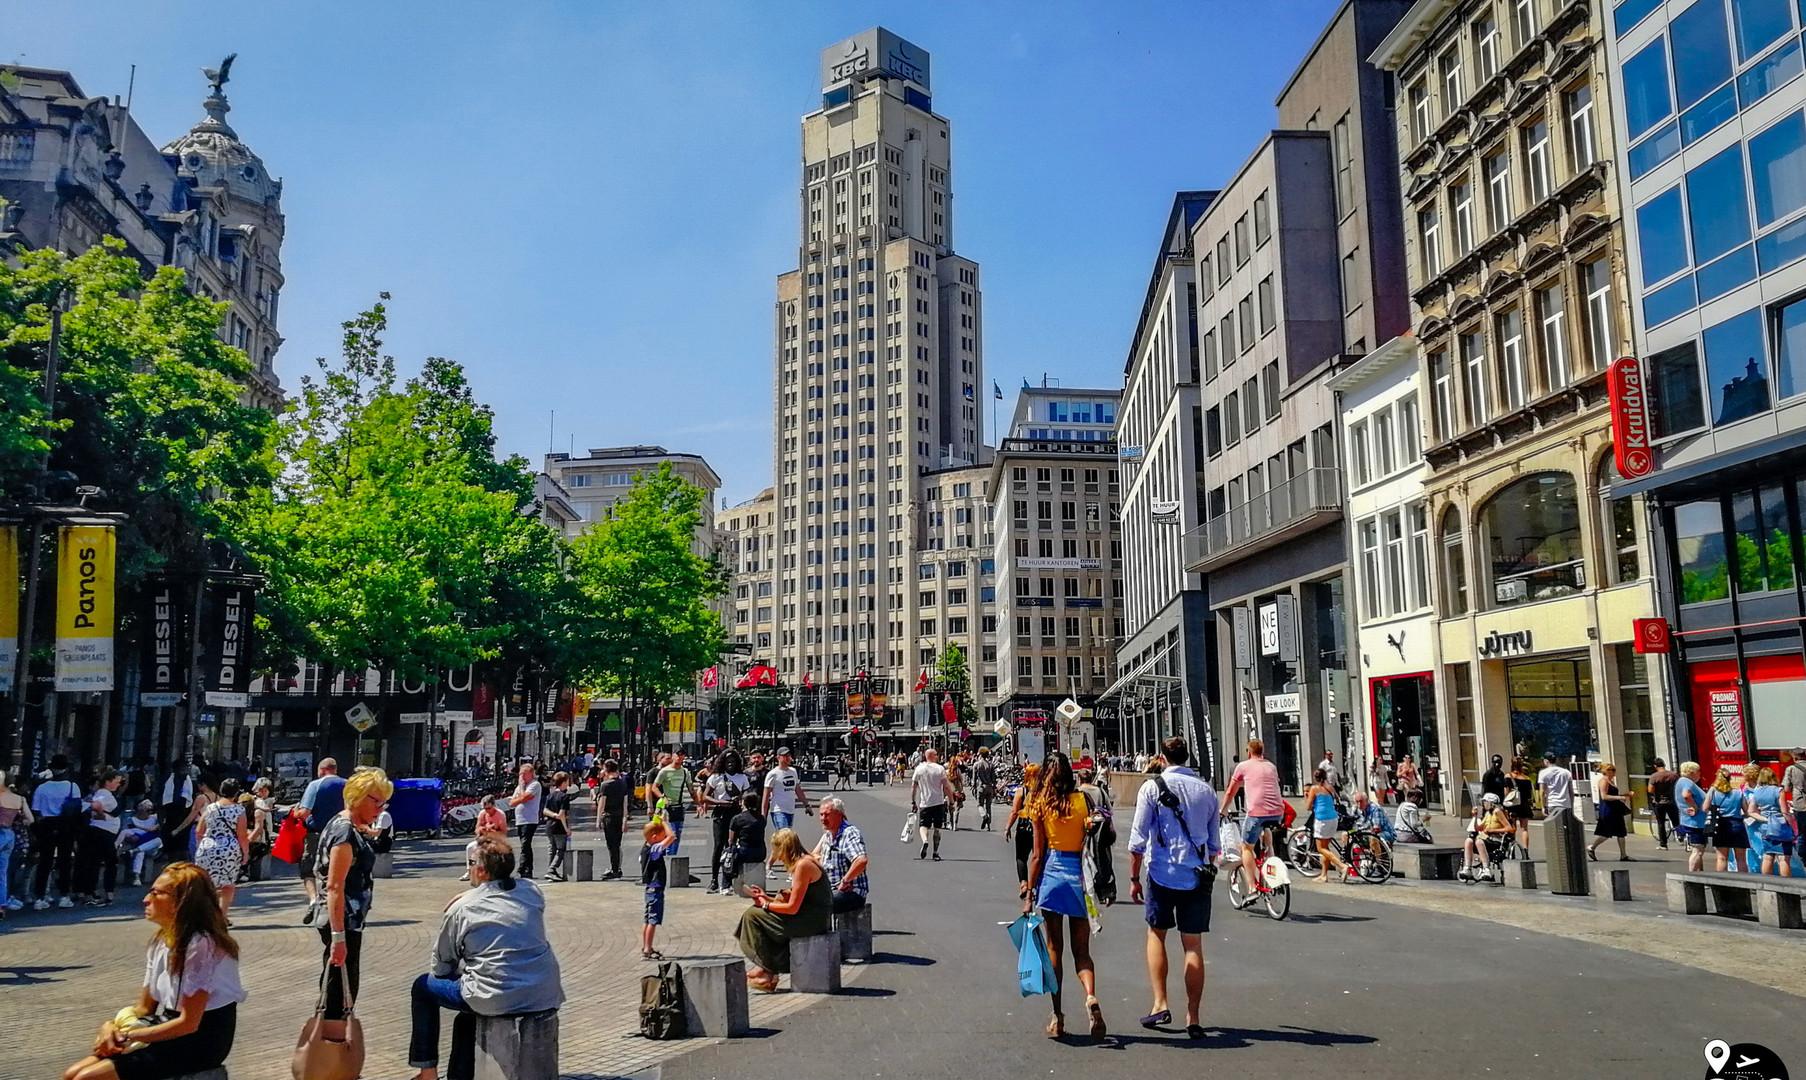 Центральные улицы Антверпена